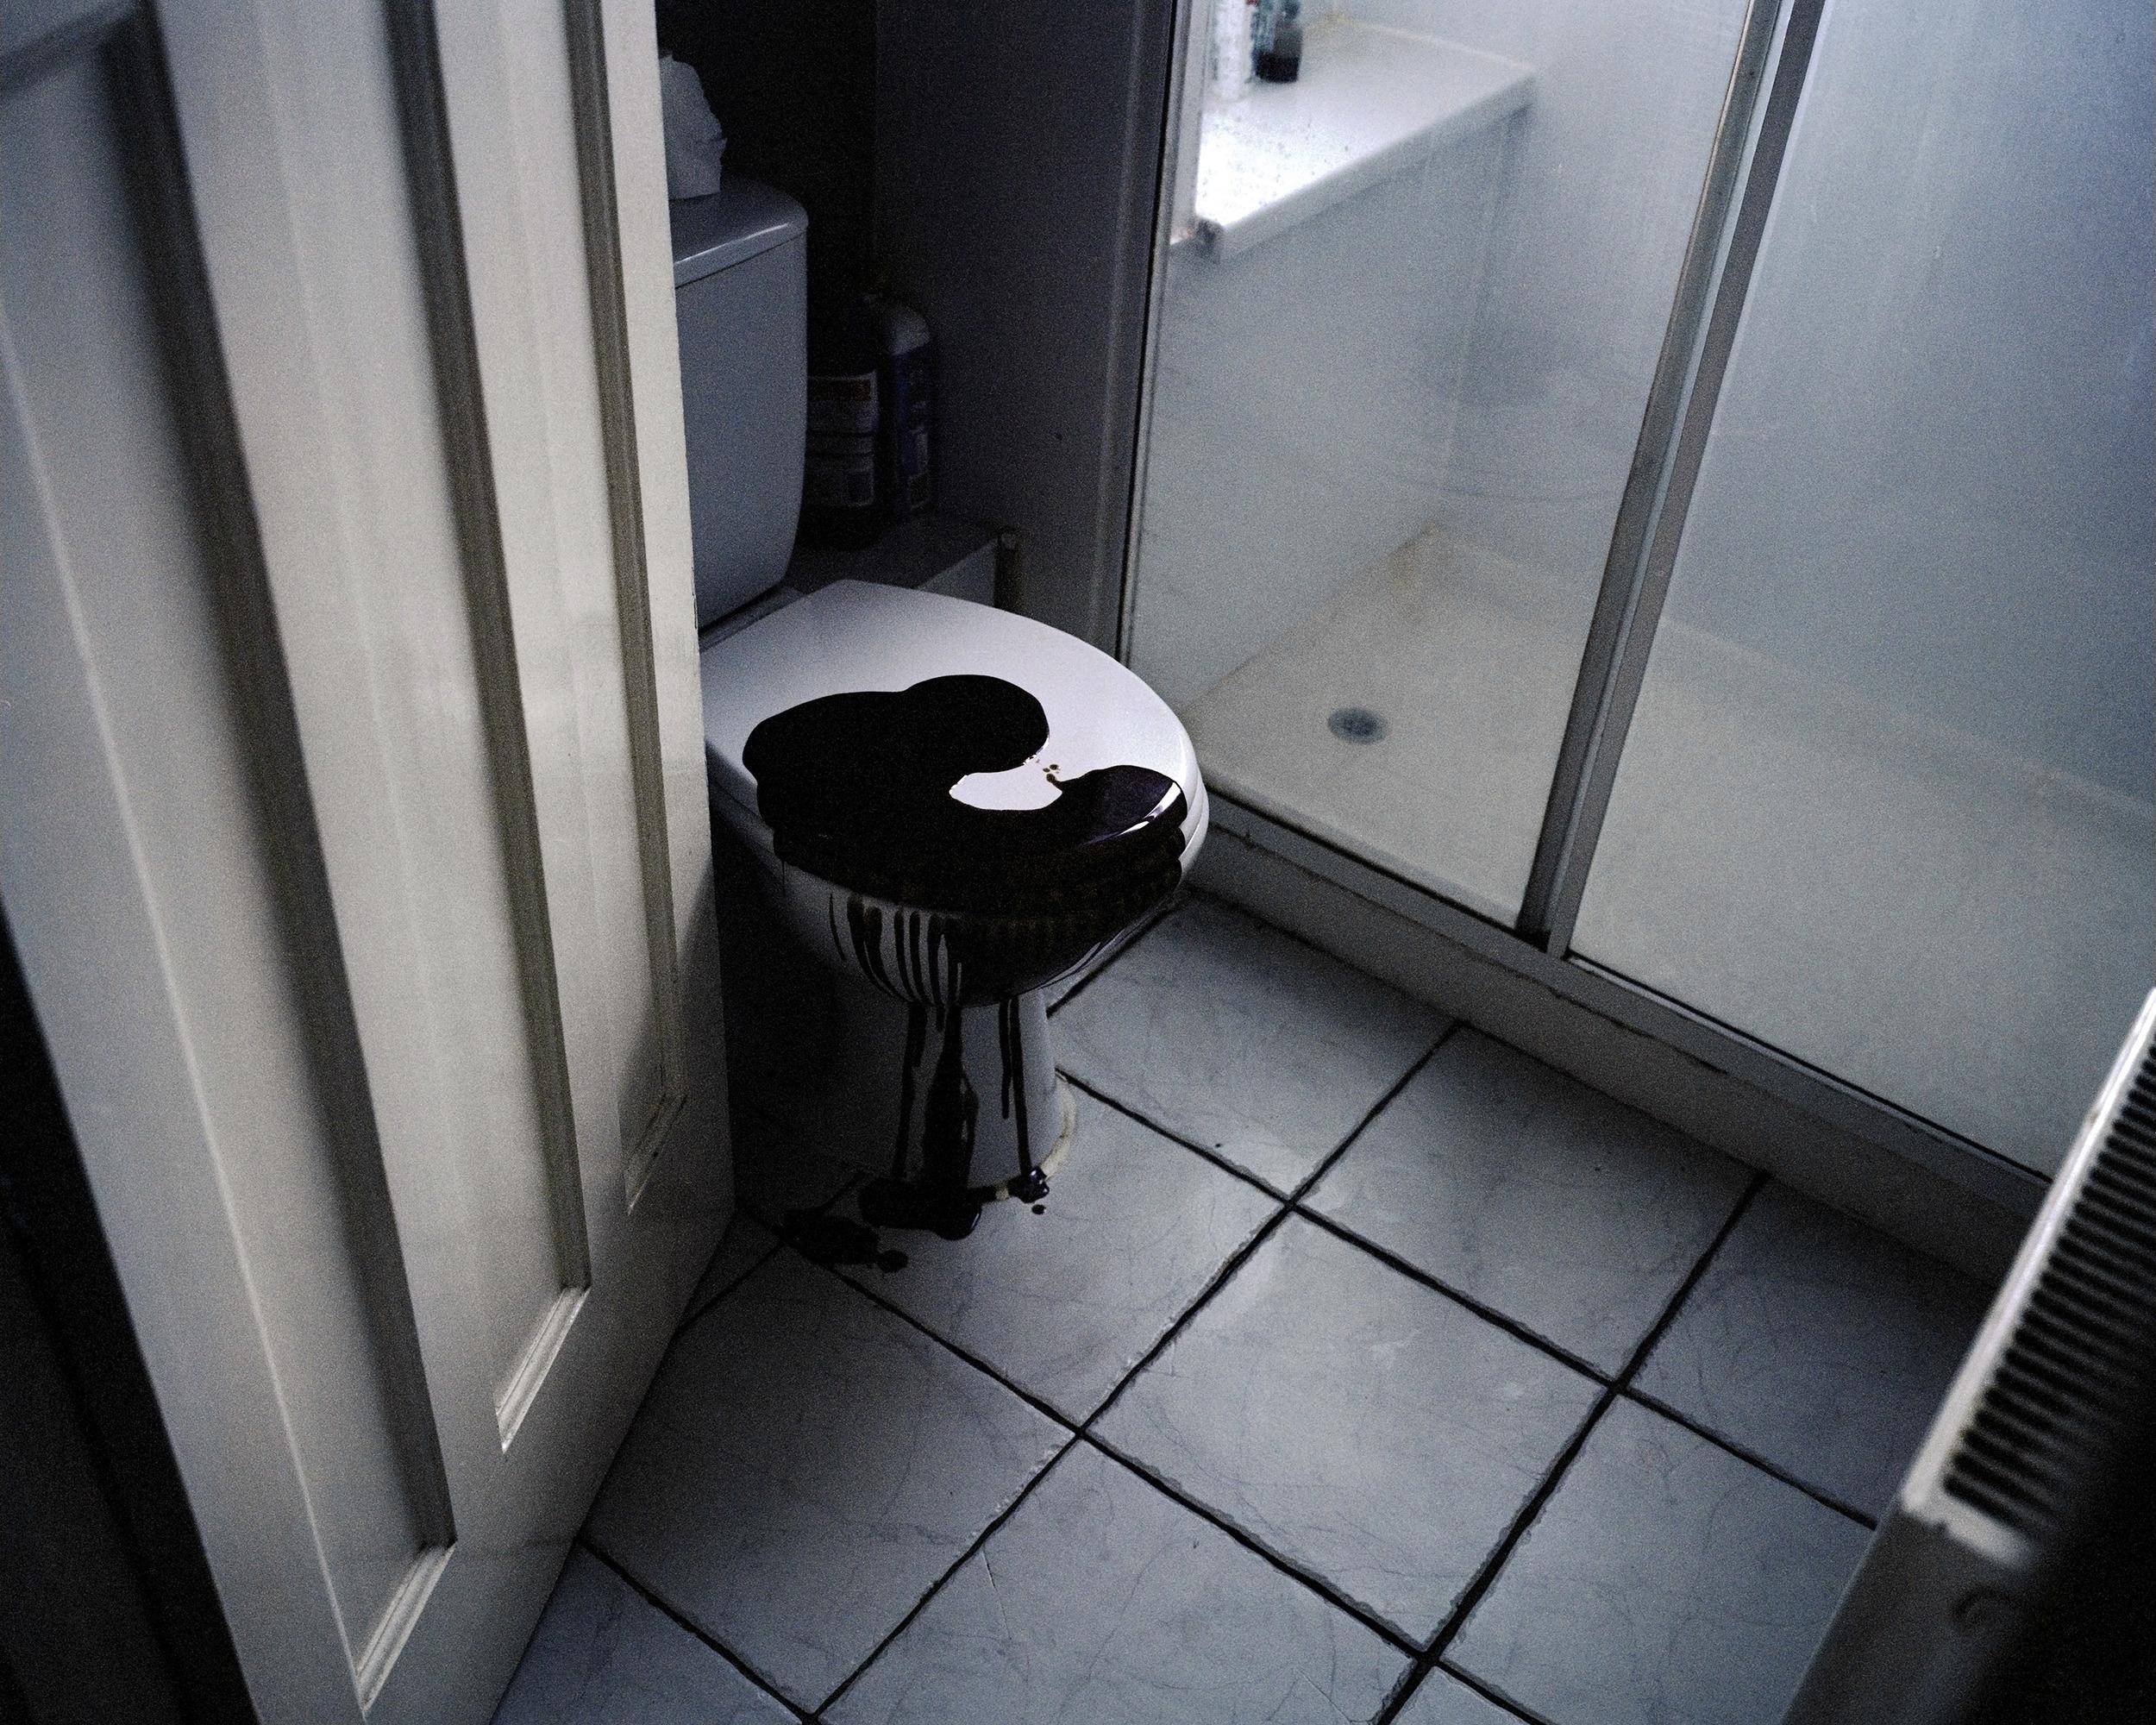 toiletoil3 scan 4.jpg